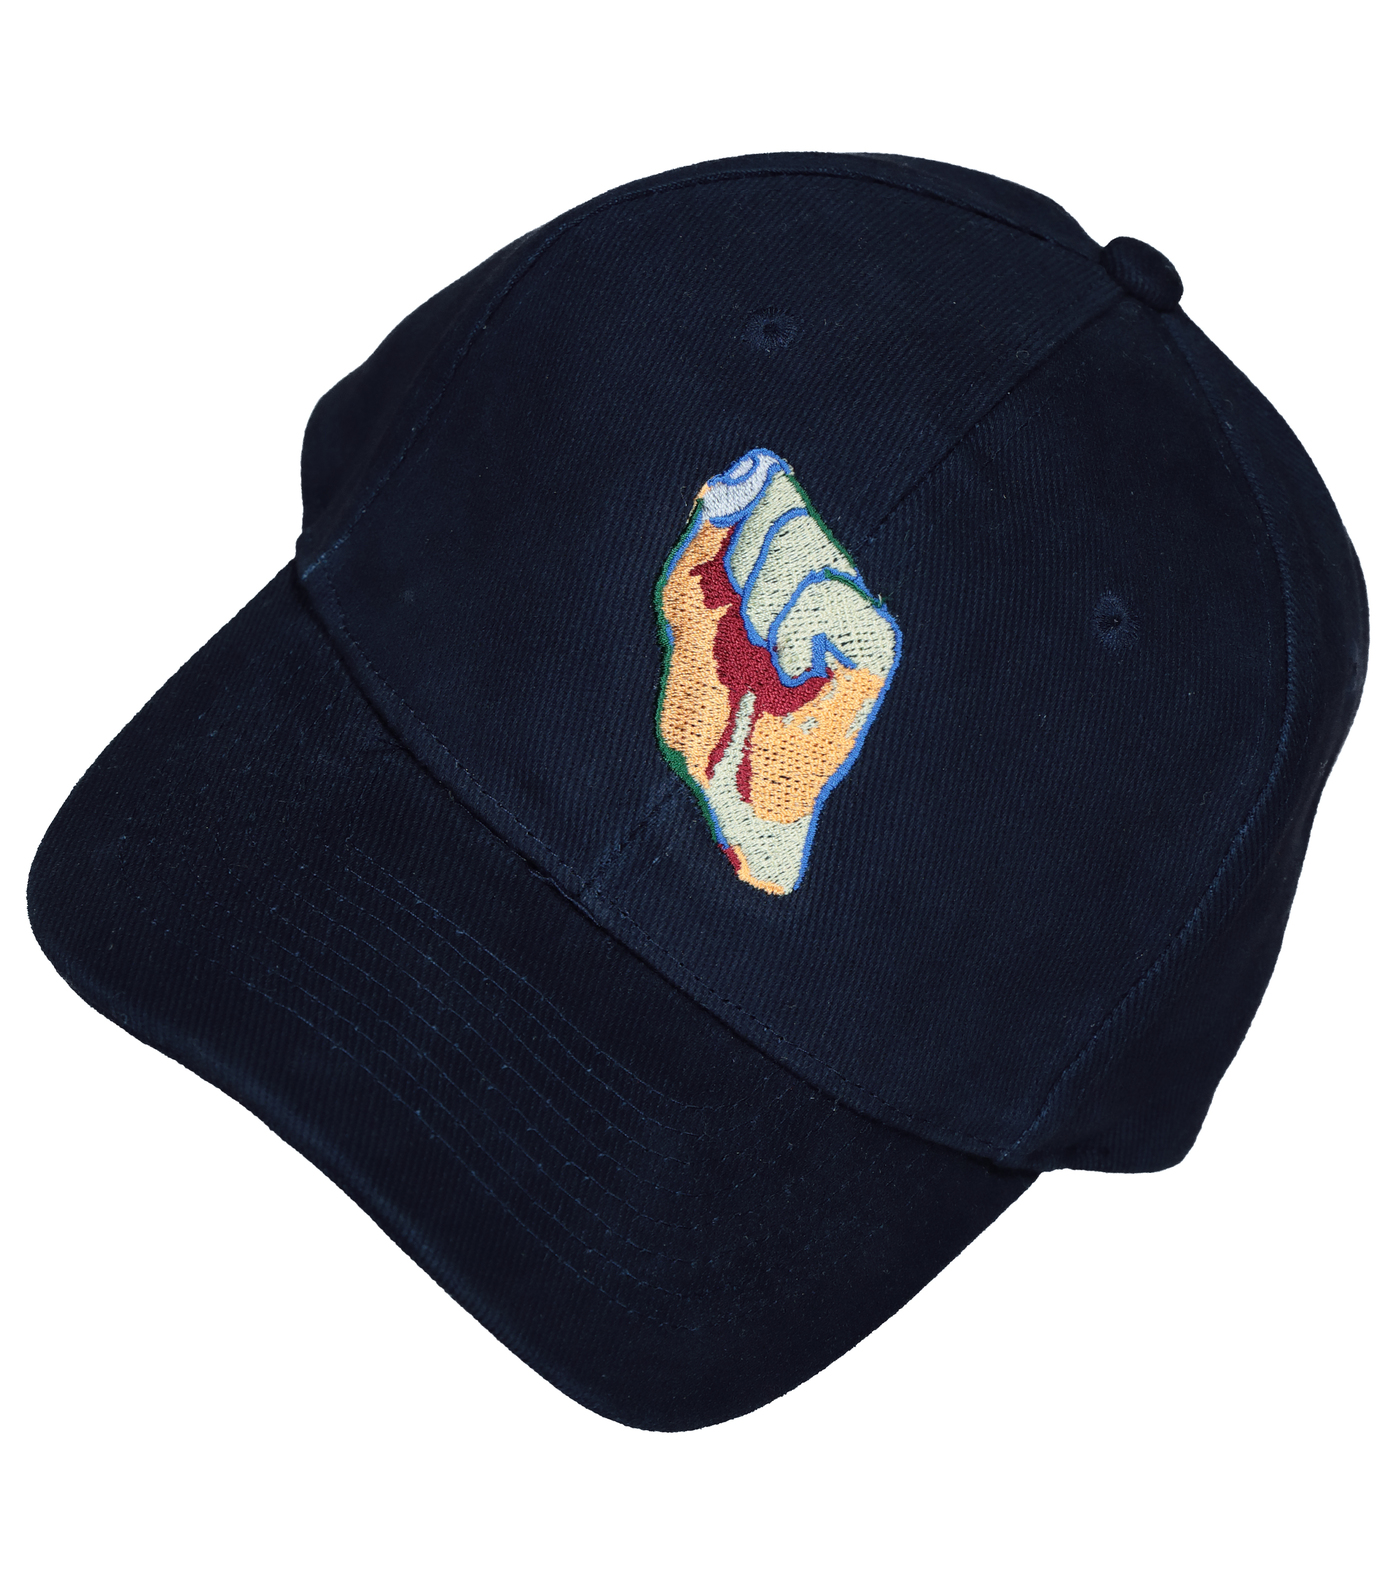 CAP EN AVANT - Navy